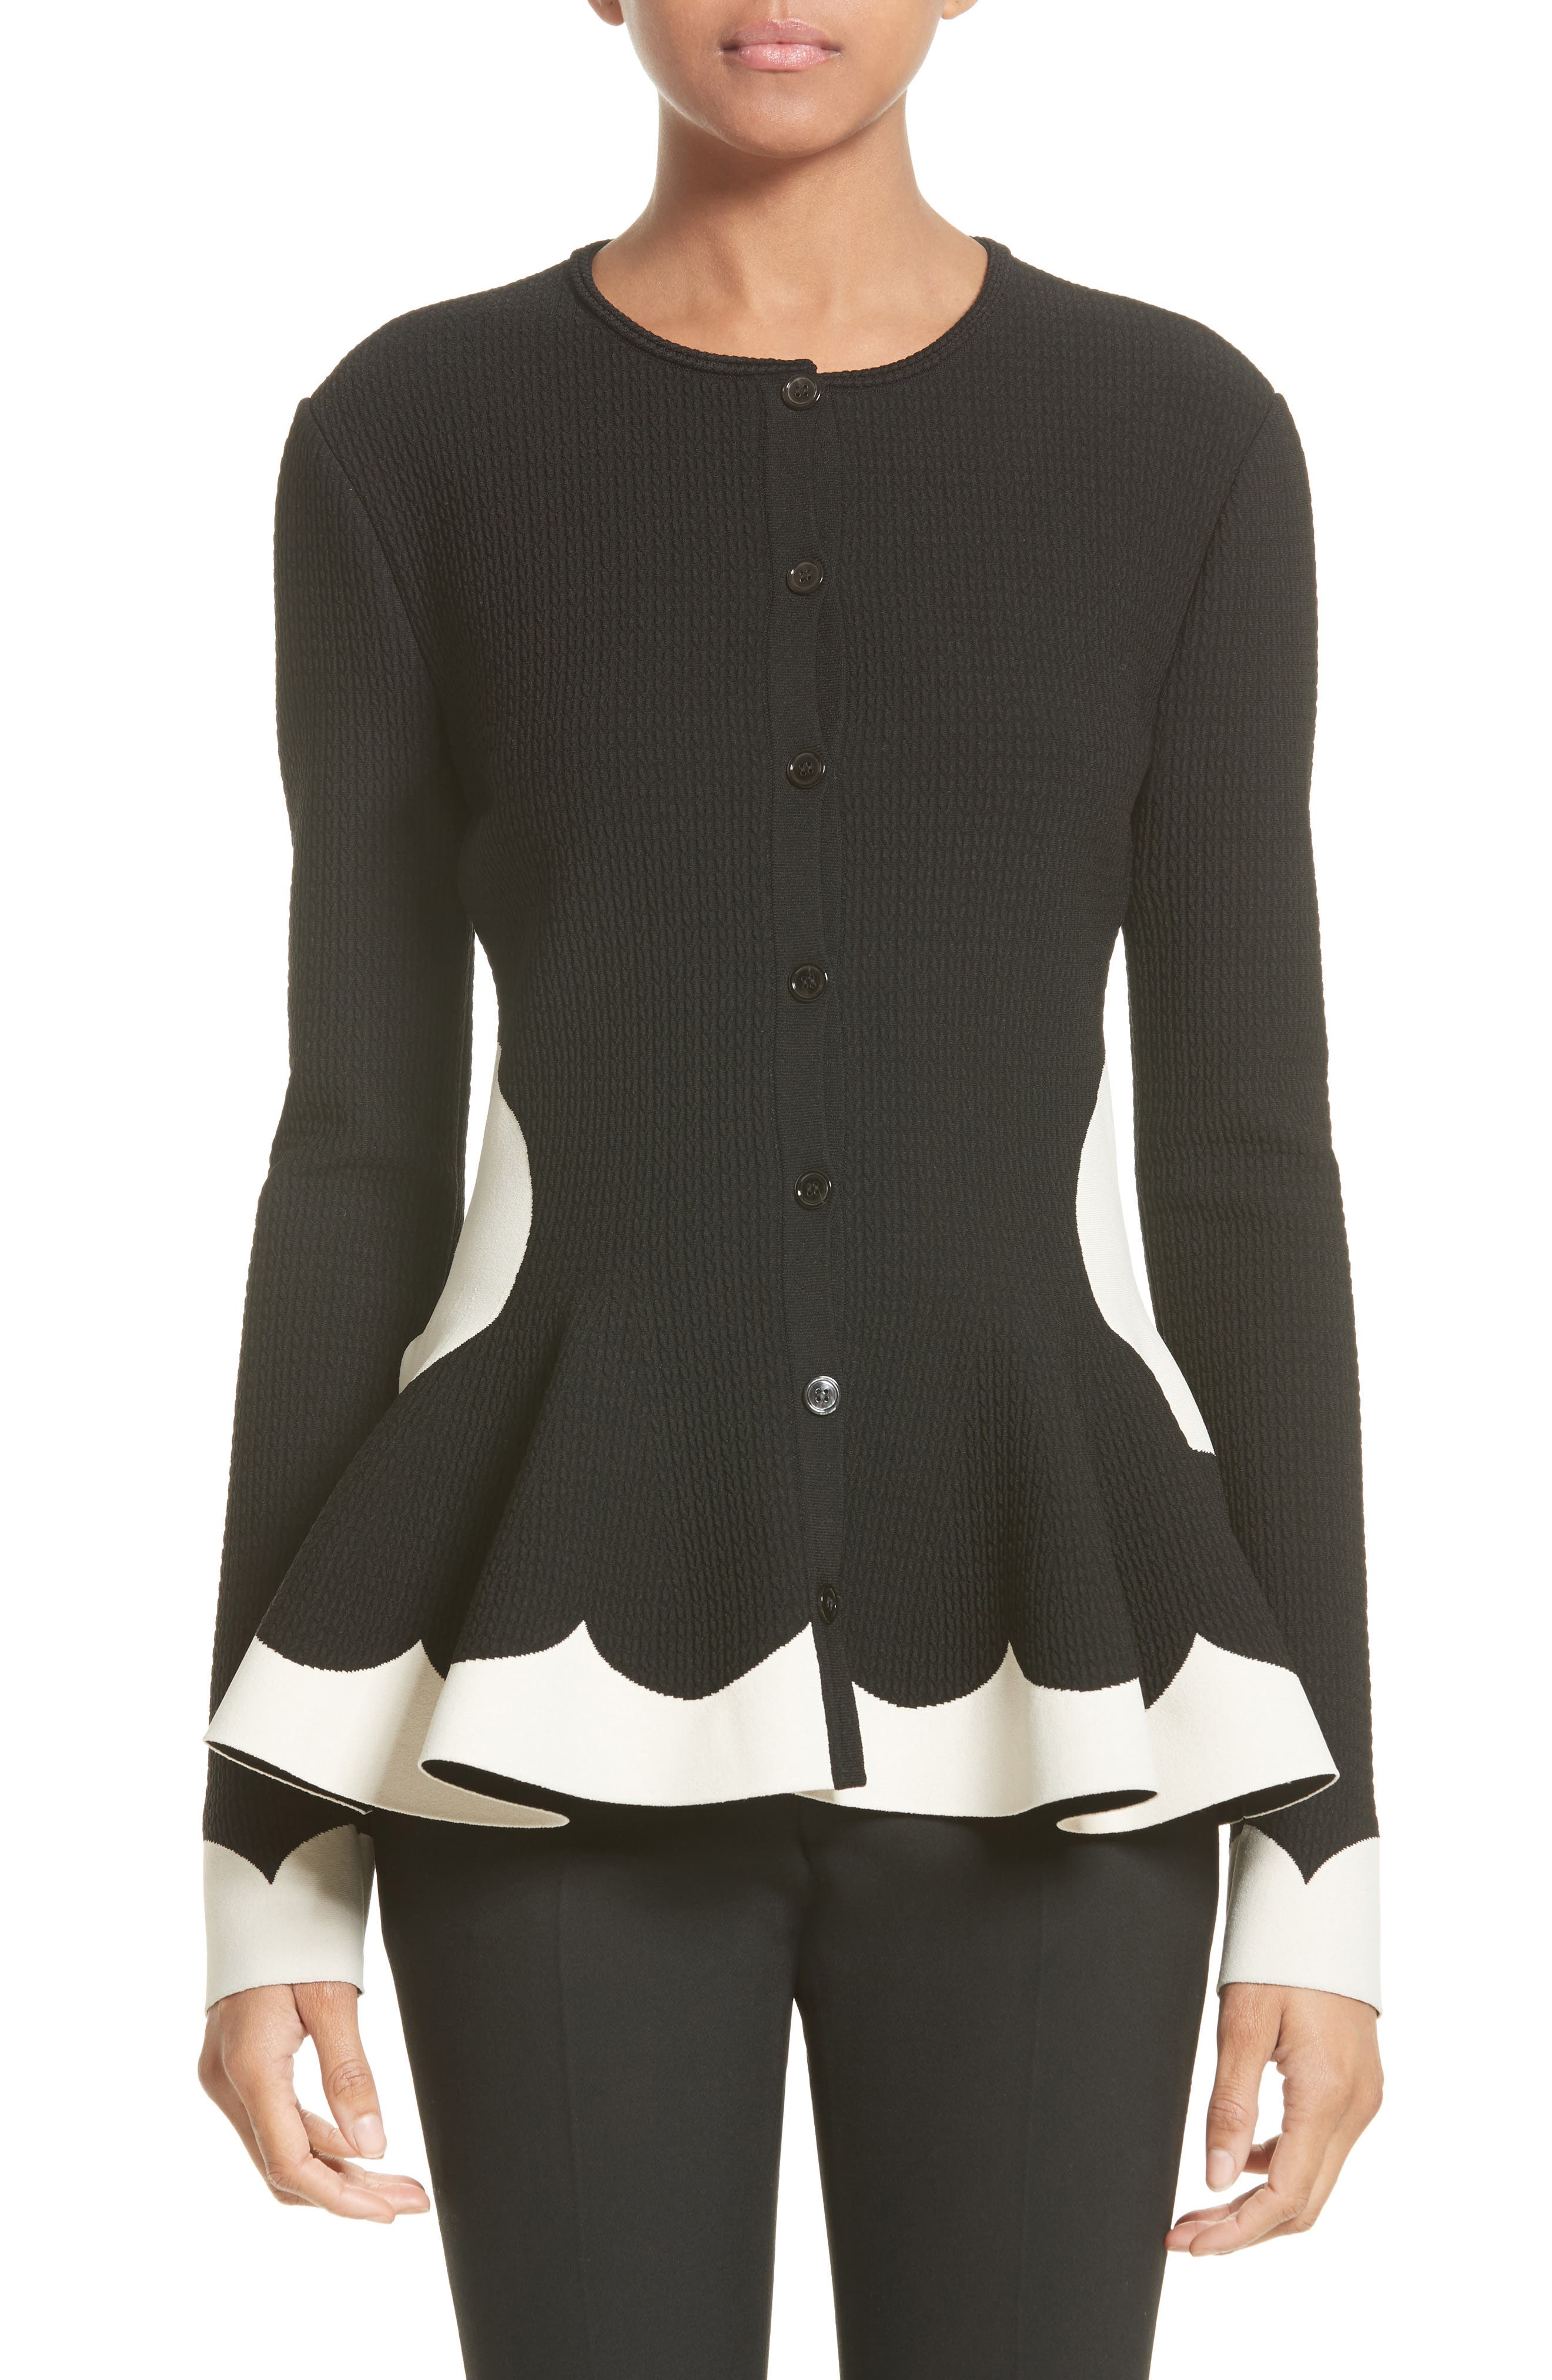 Bicolor Contrast Jacquard Peplum Cardigan,                         Main,                         color, Black/ Ivory